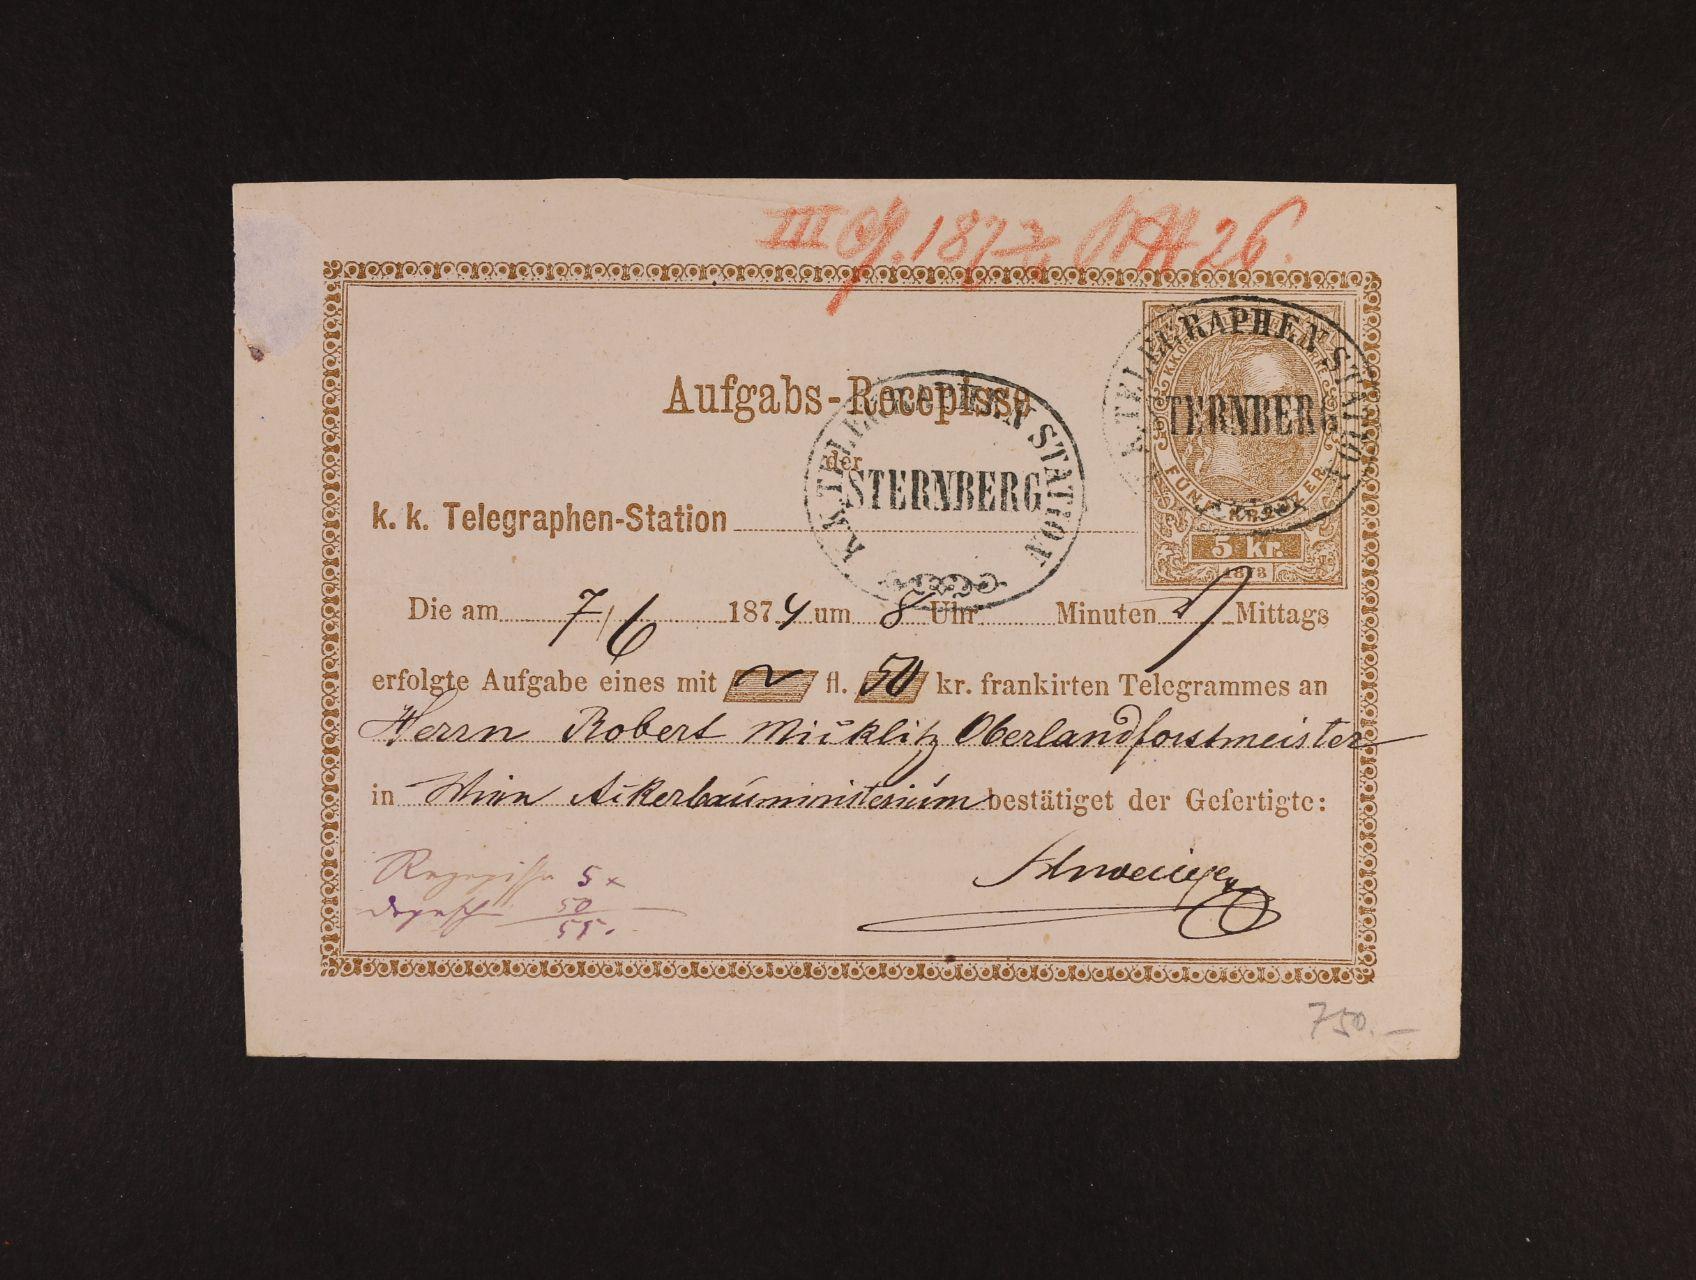 Aufgabs-Recepisse Mi. TA č. 5, pod. raz. K.K. TELEGRAPHEN STATION STERNBERG s datací v textu 1874